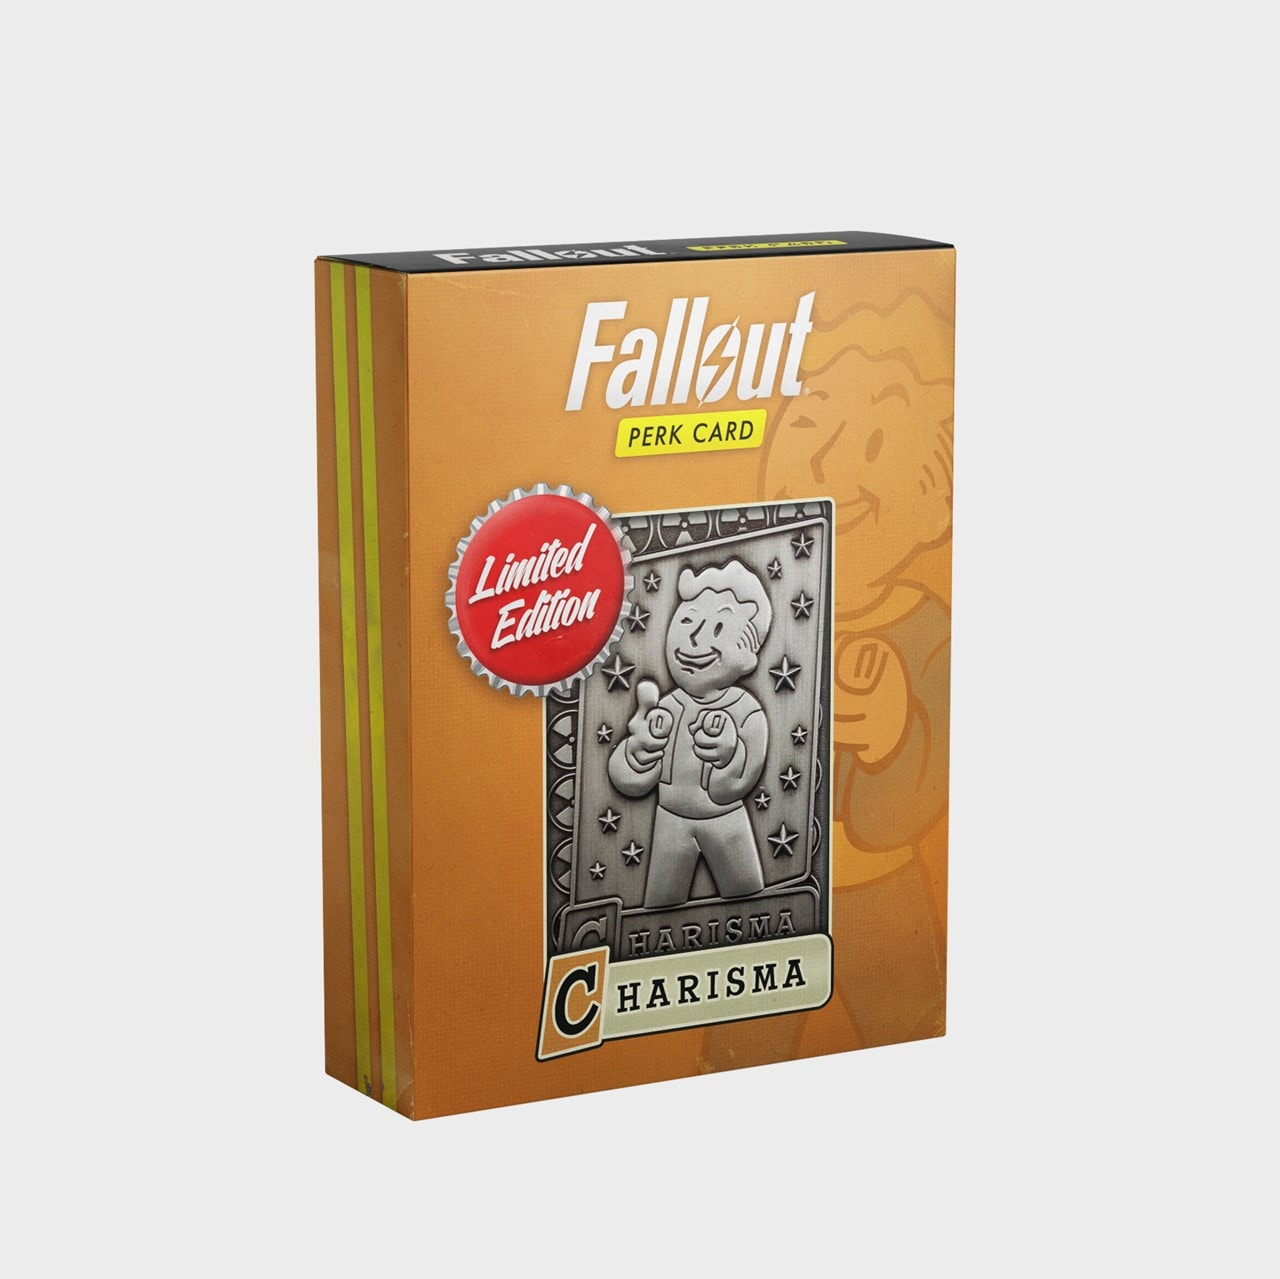 Fallout: Charisma Metal Perk Card - 1